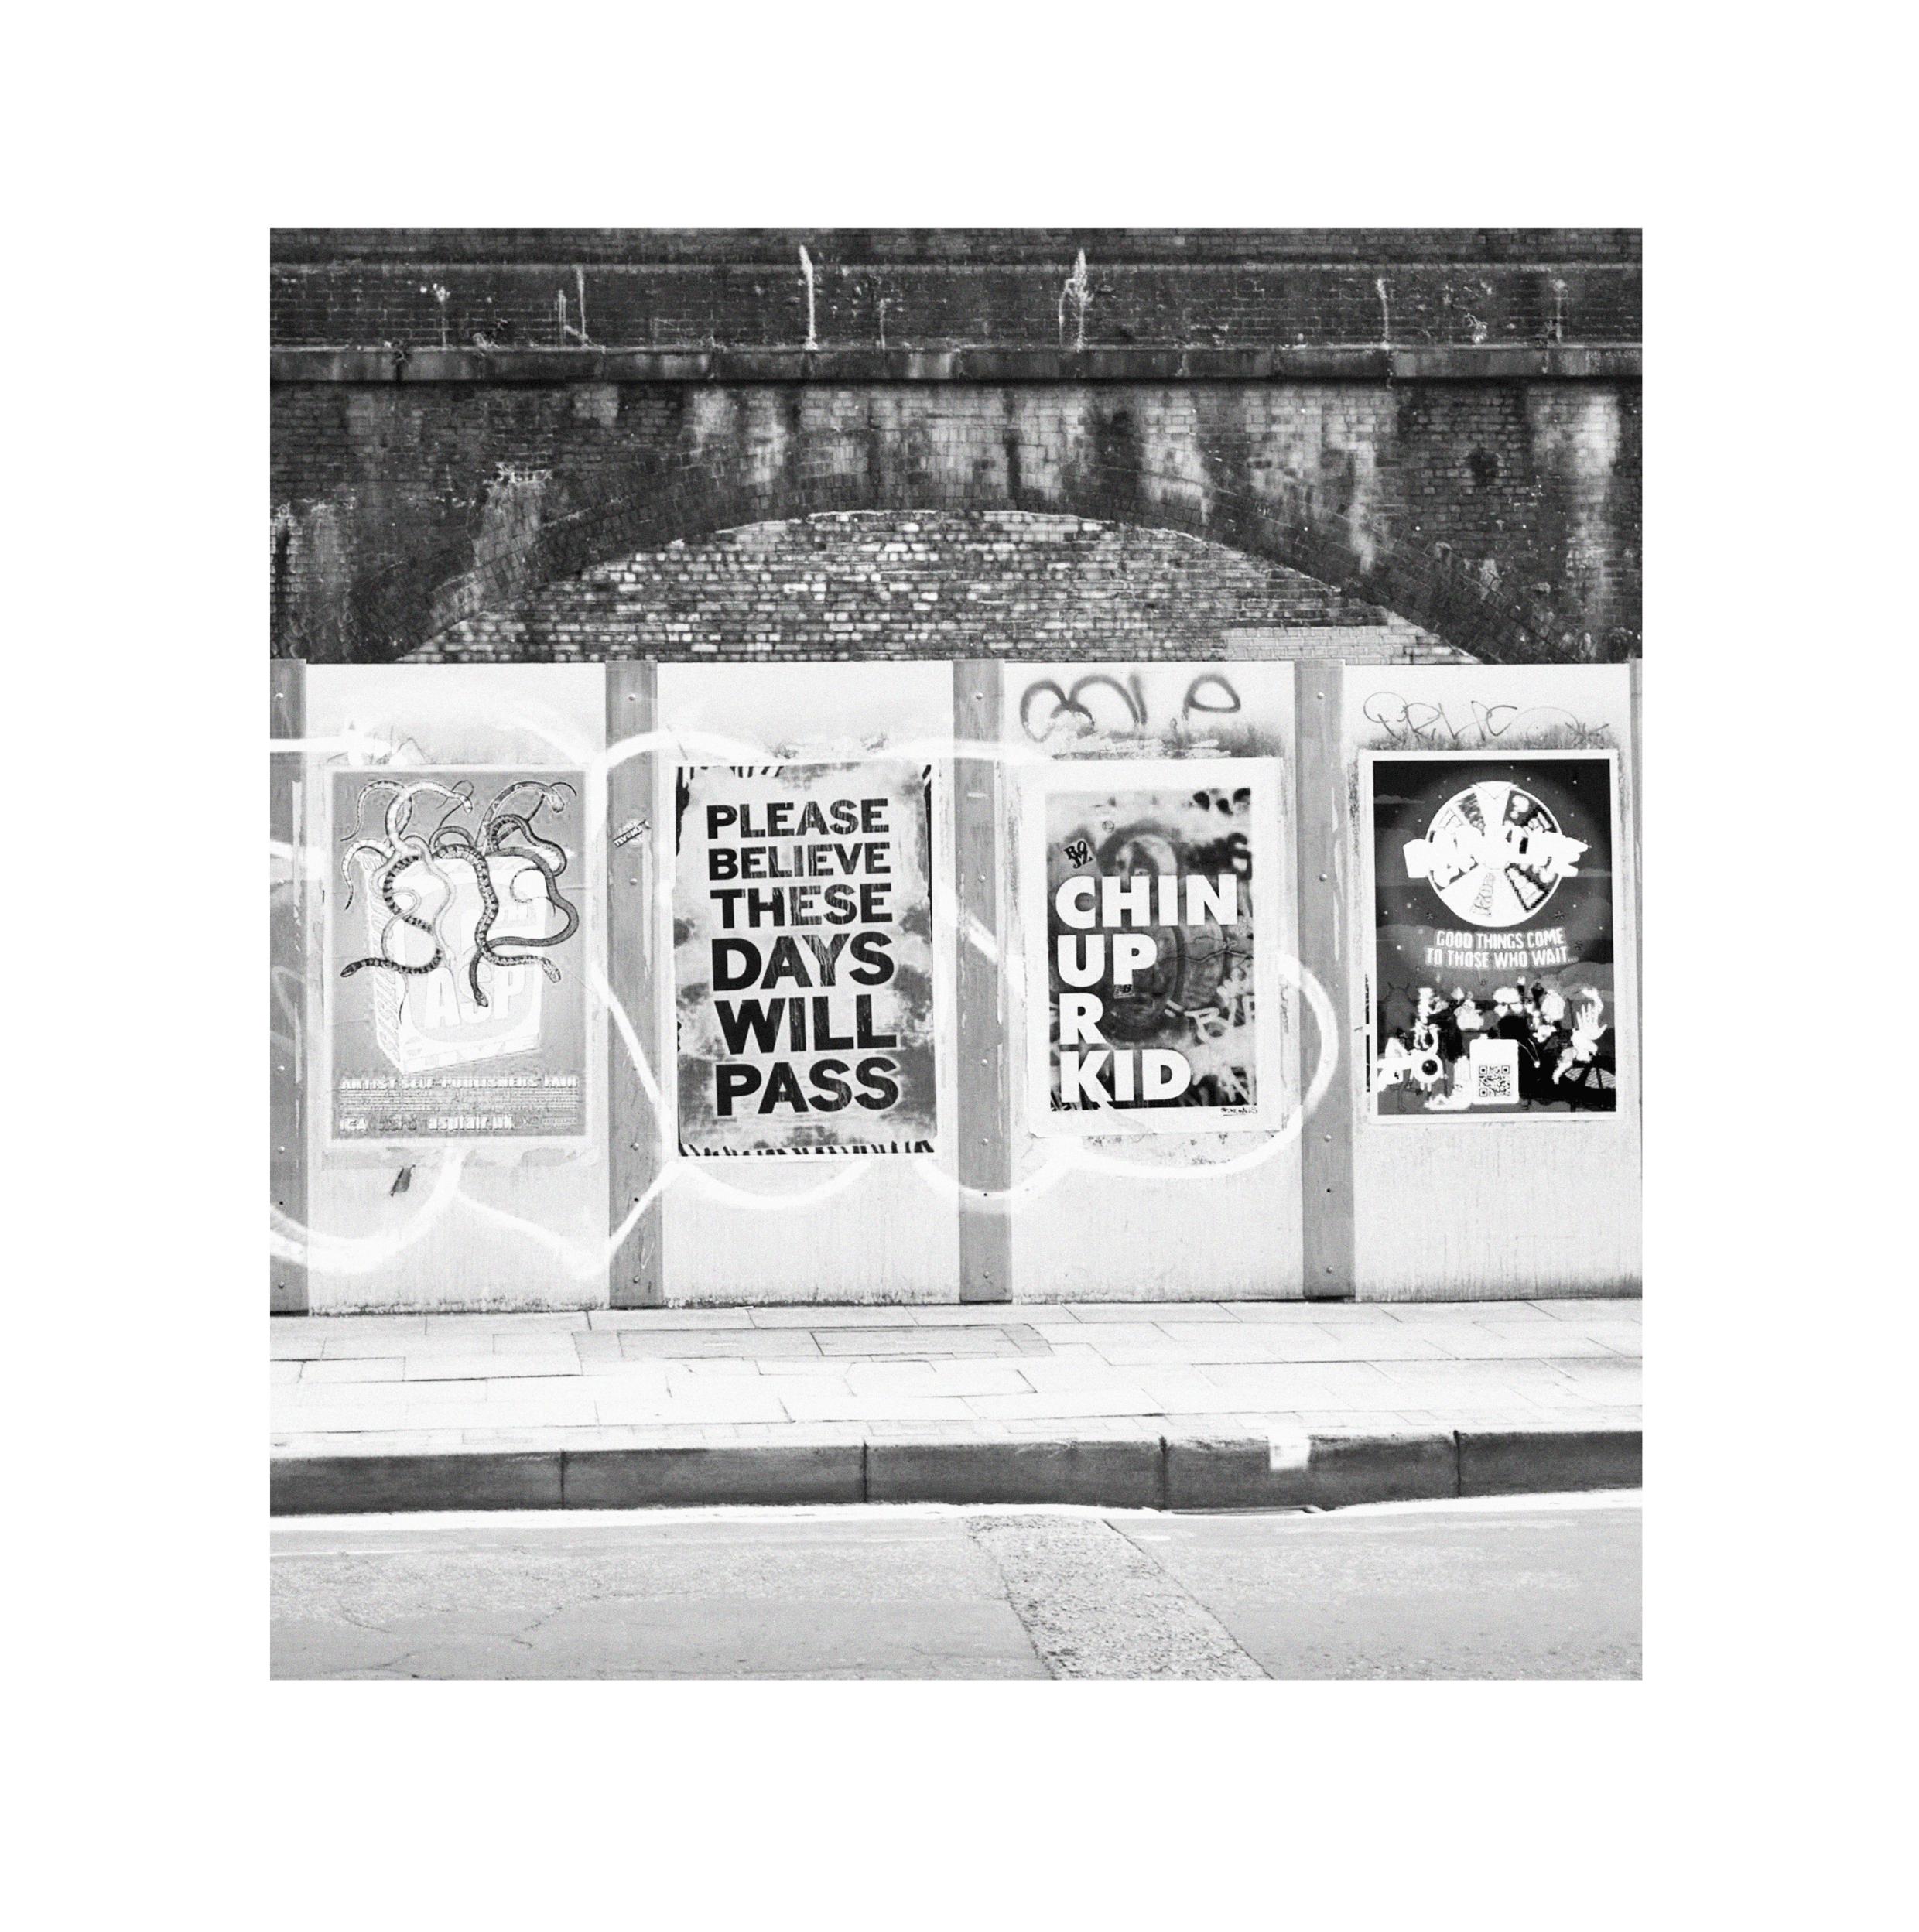 Series of posters on a wall taken by Nia Thomas. Manctopia.